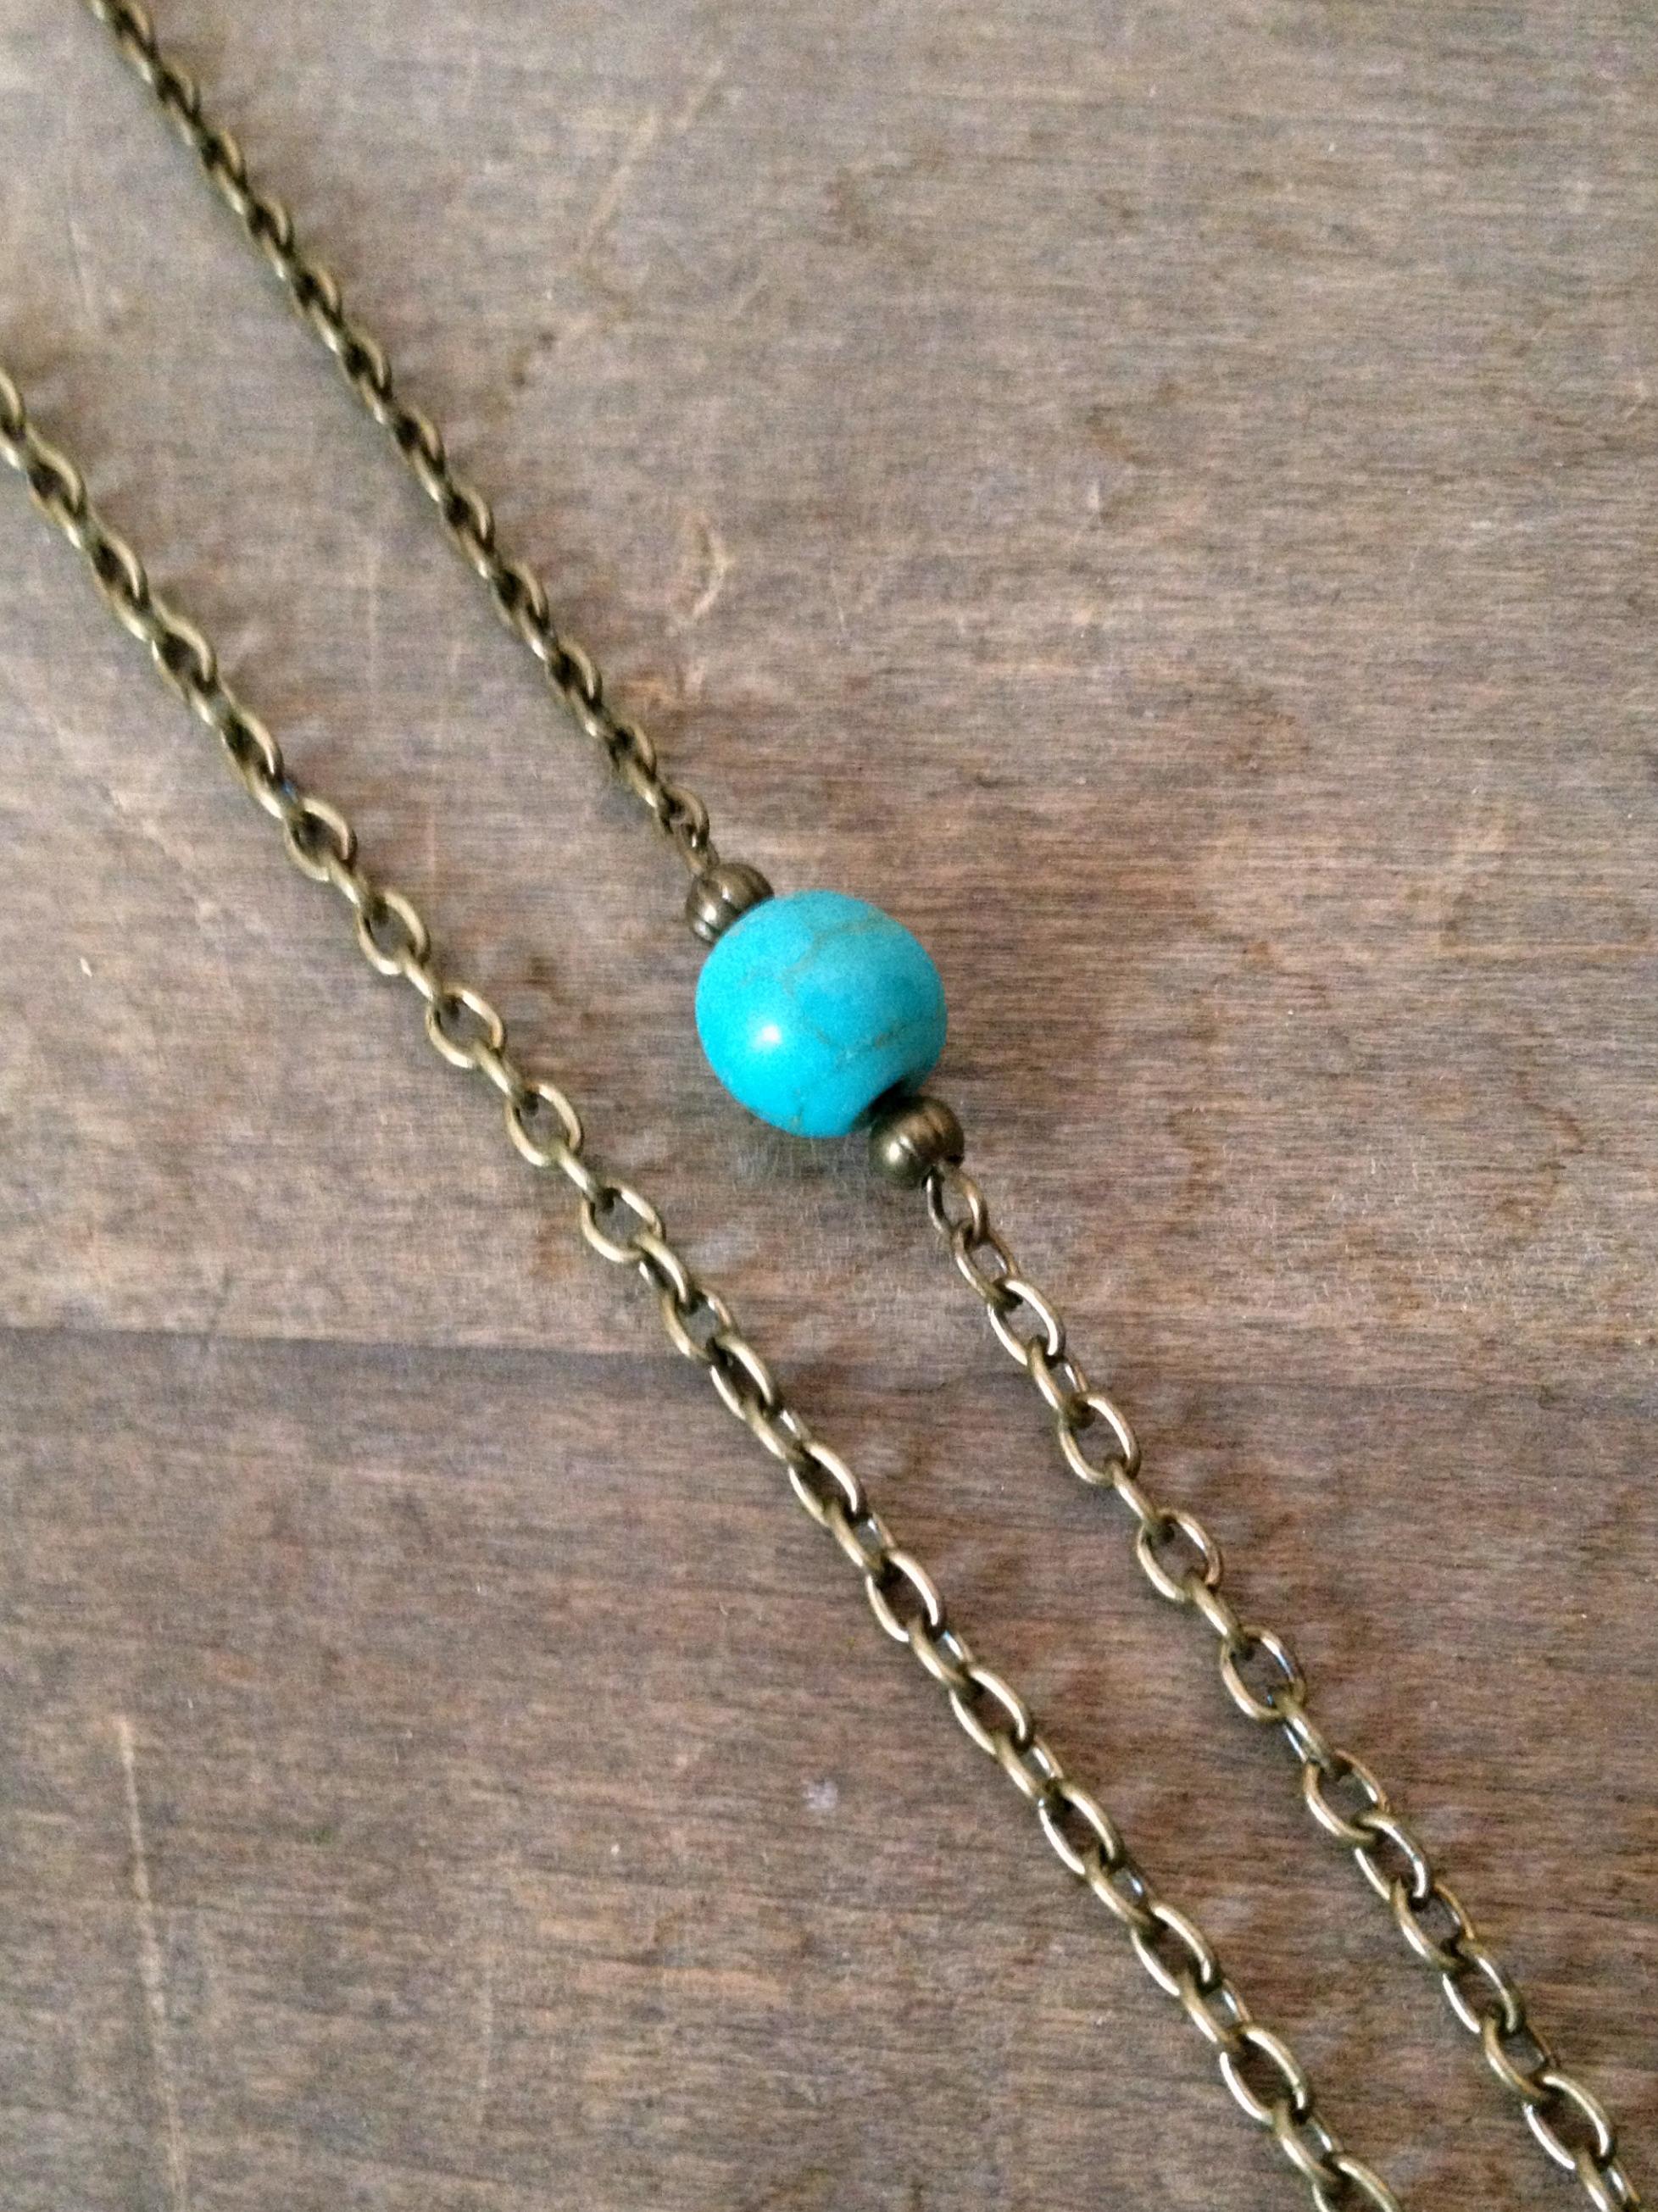 mini_pocket_knife_necklace_necklaces_3.jpg